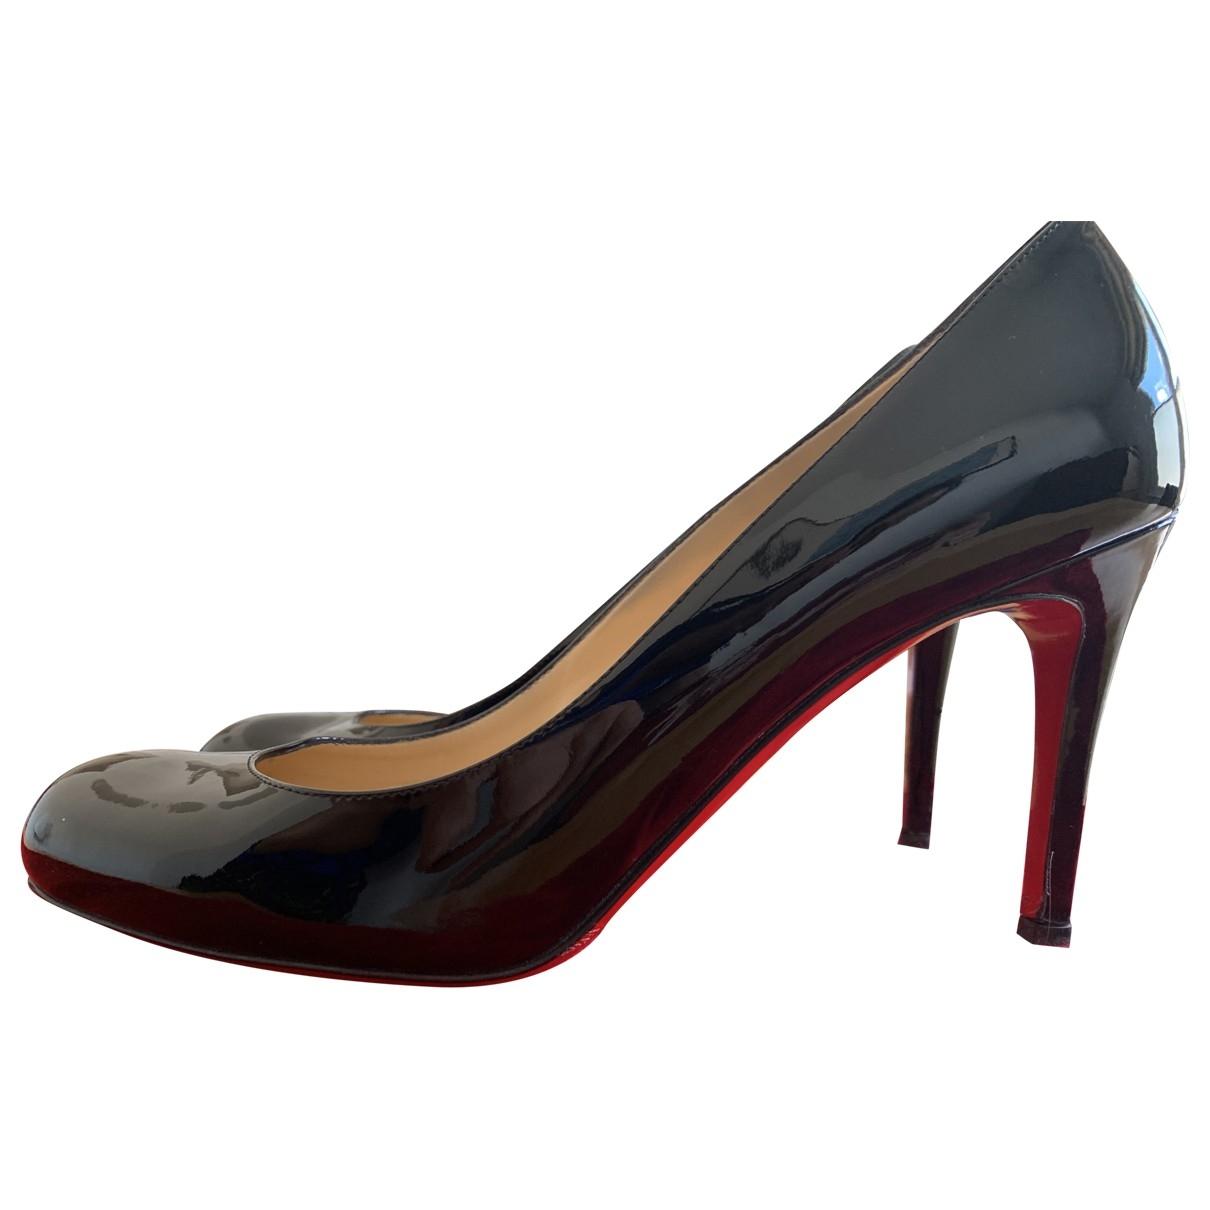 Christian Louboutin Simple pump Black Patent leather Heels for Women 38.5 EU